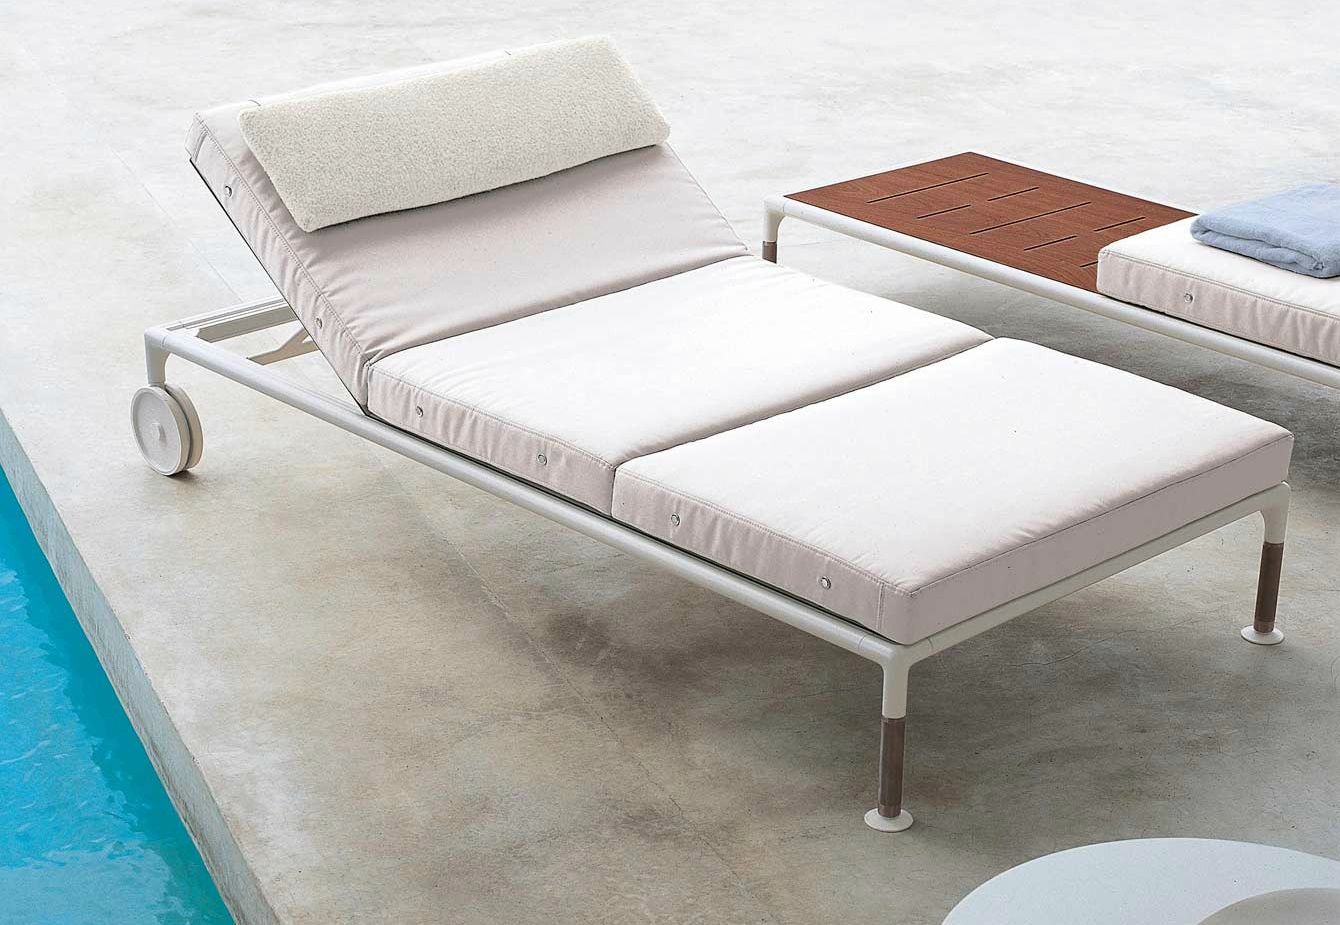 springtime gartenliege mit rollen by b b italia outdoor a brand of b b italia spa design jean. Black Bedroom Furniture Sets. Home Design Ideas